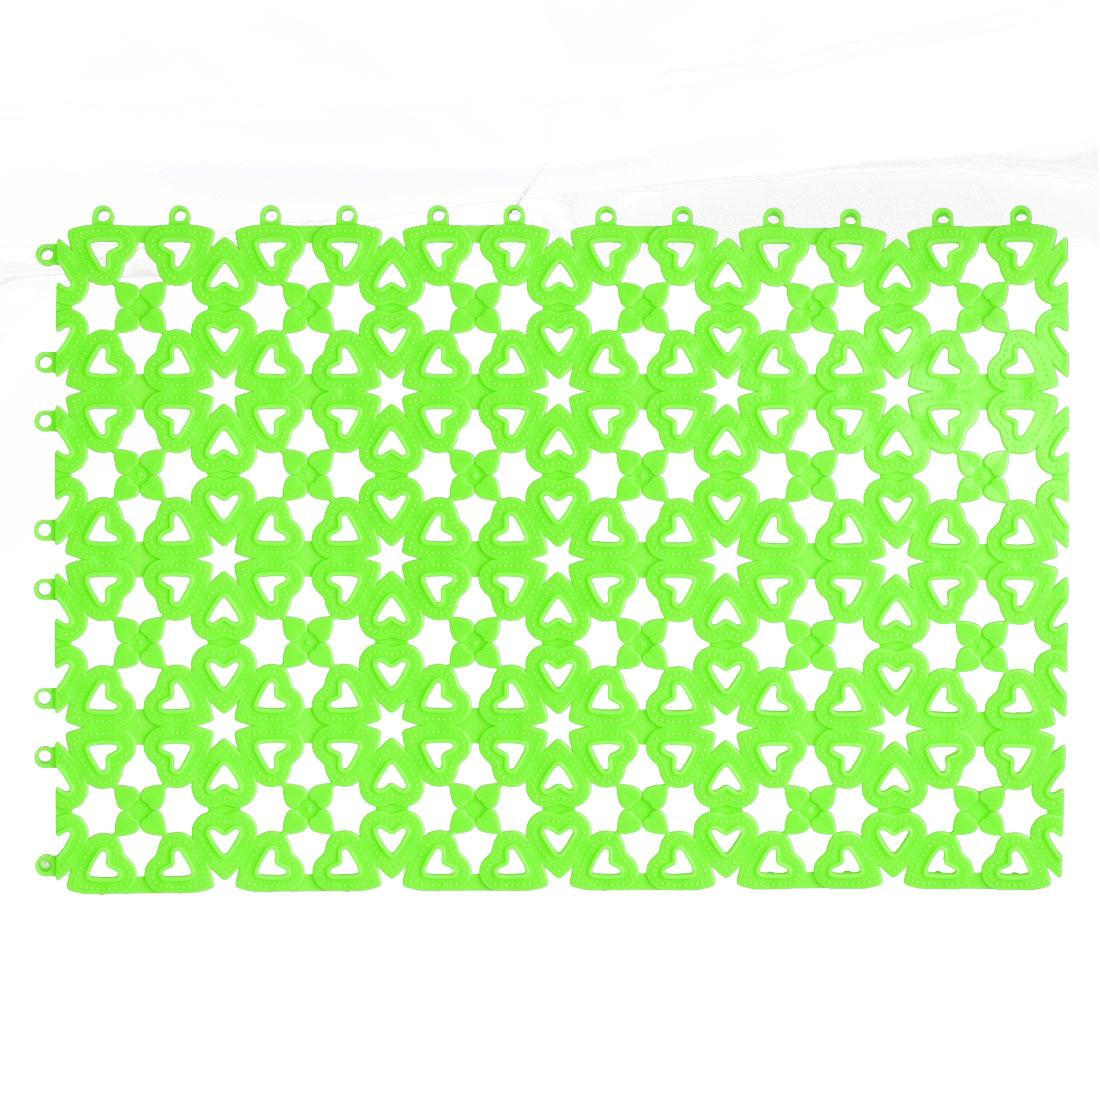 Plastic Free Split Joint Water Resistant Anti-slip Shower Bath Mat Green